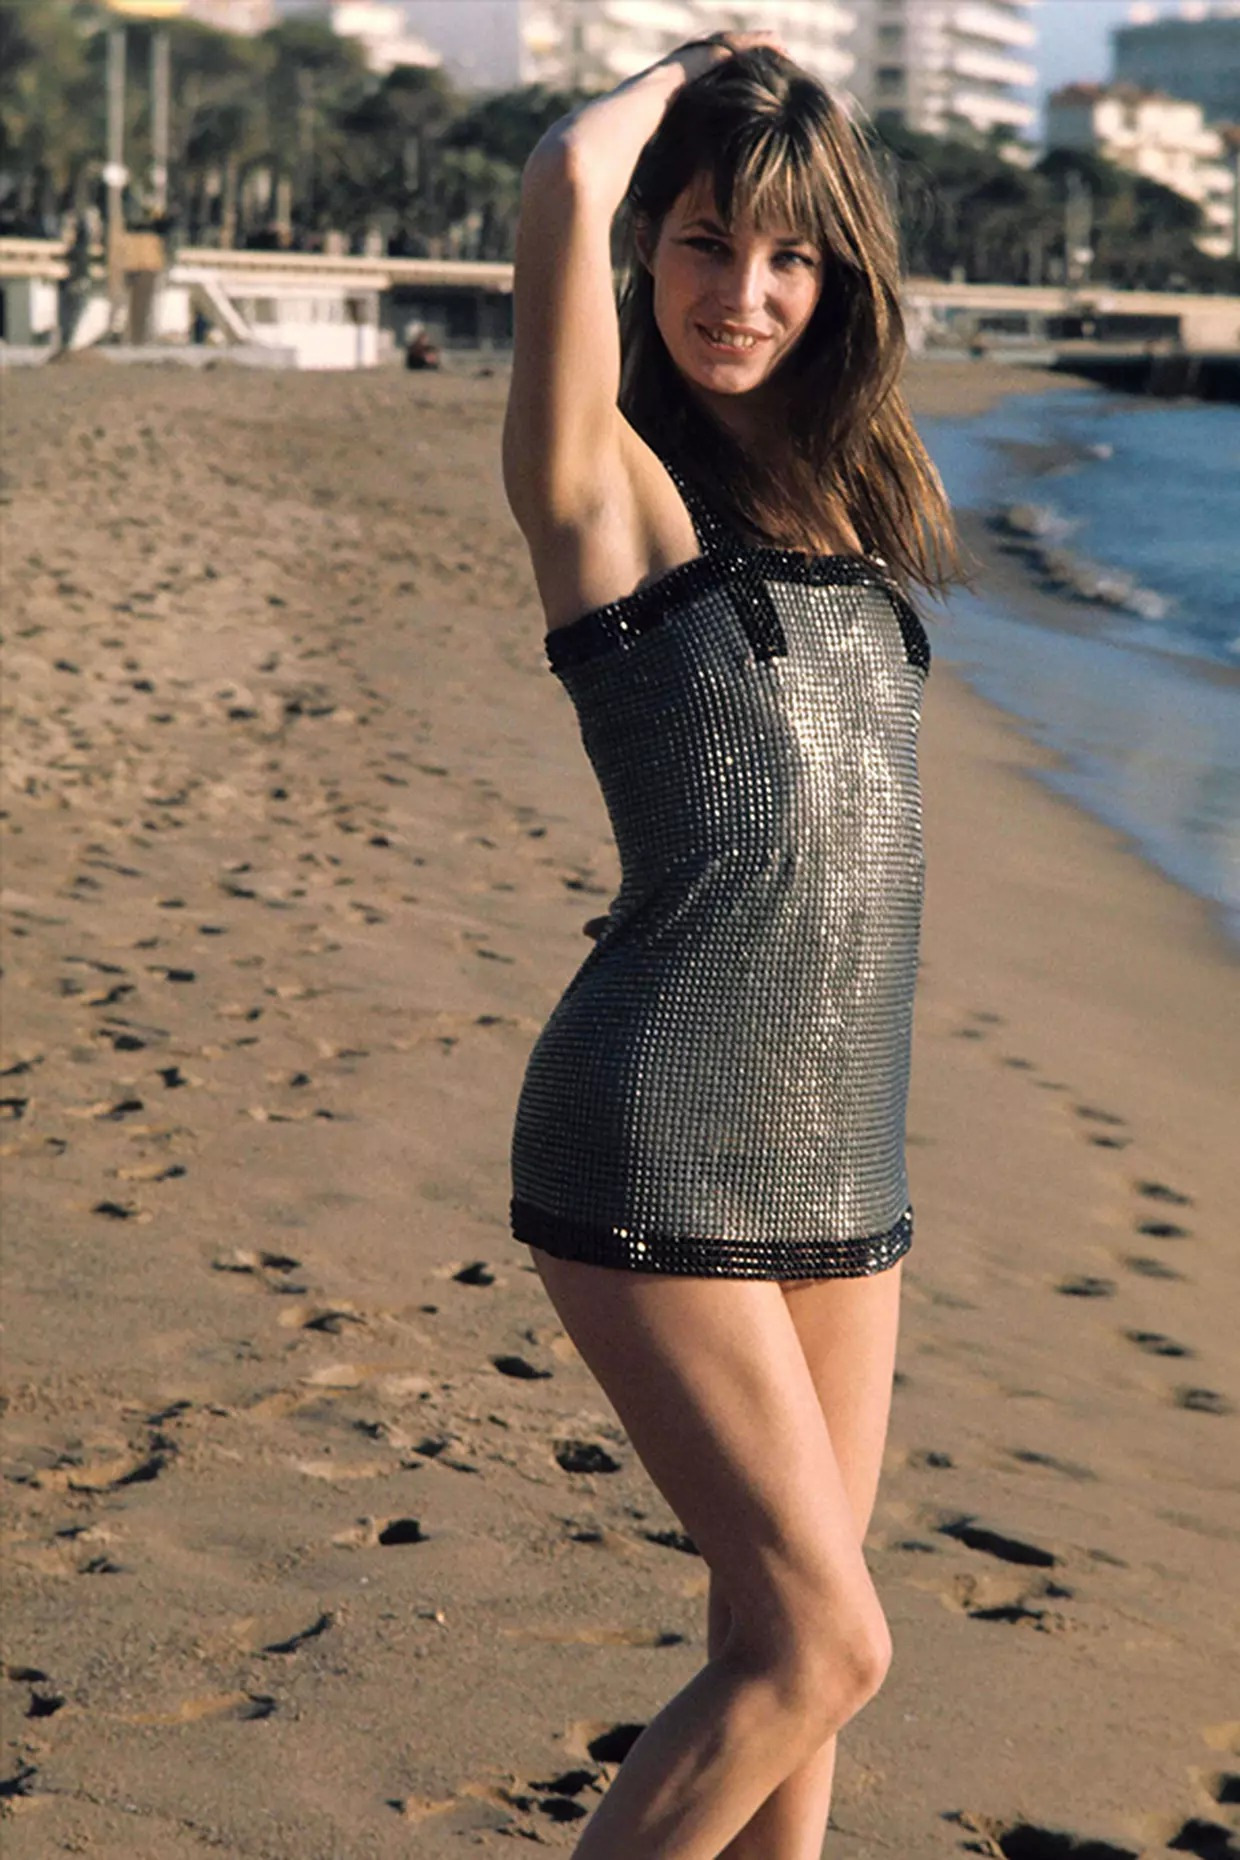 Thời trang Hè - Jane Birkin mặc đầm sequin đi biển